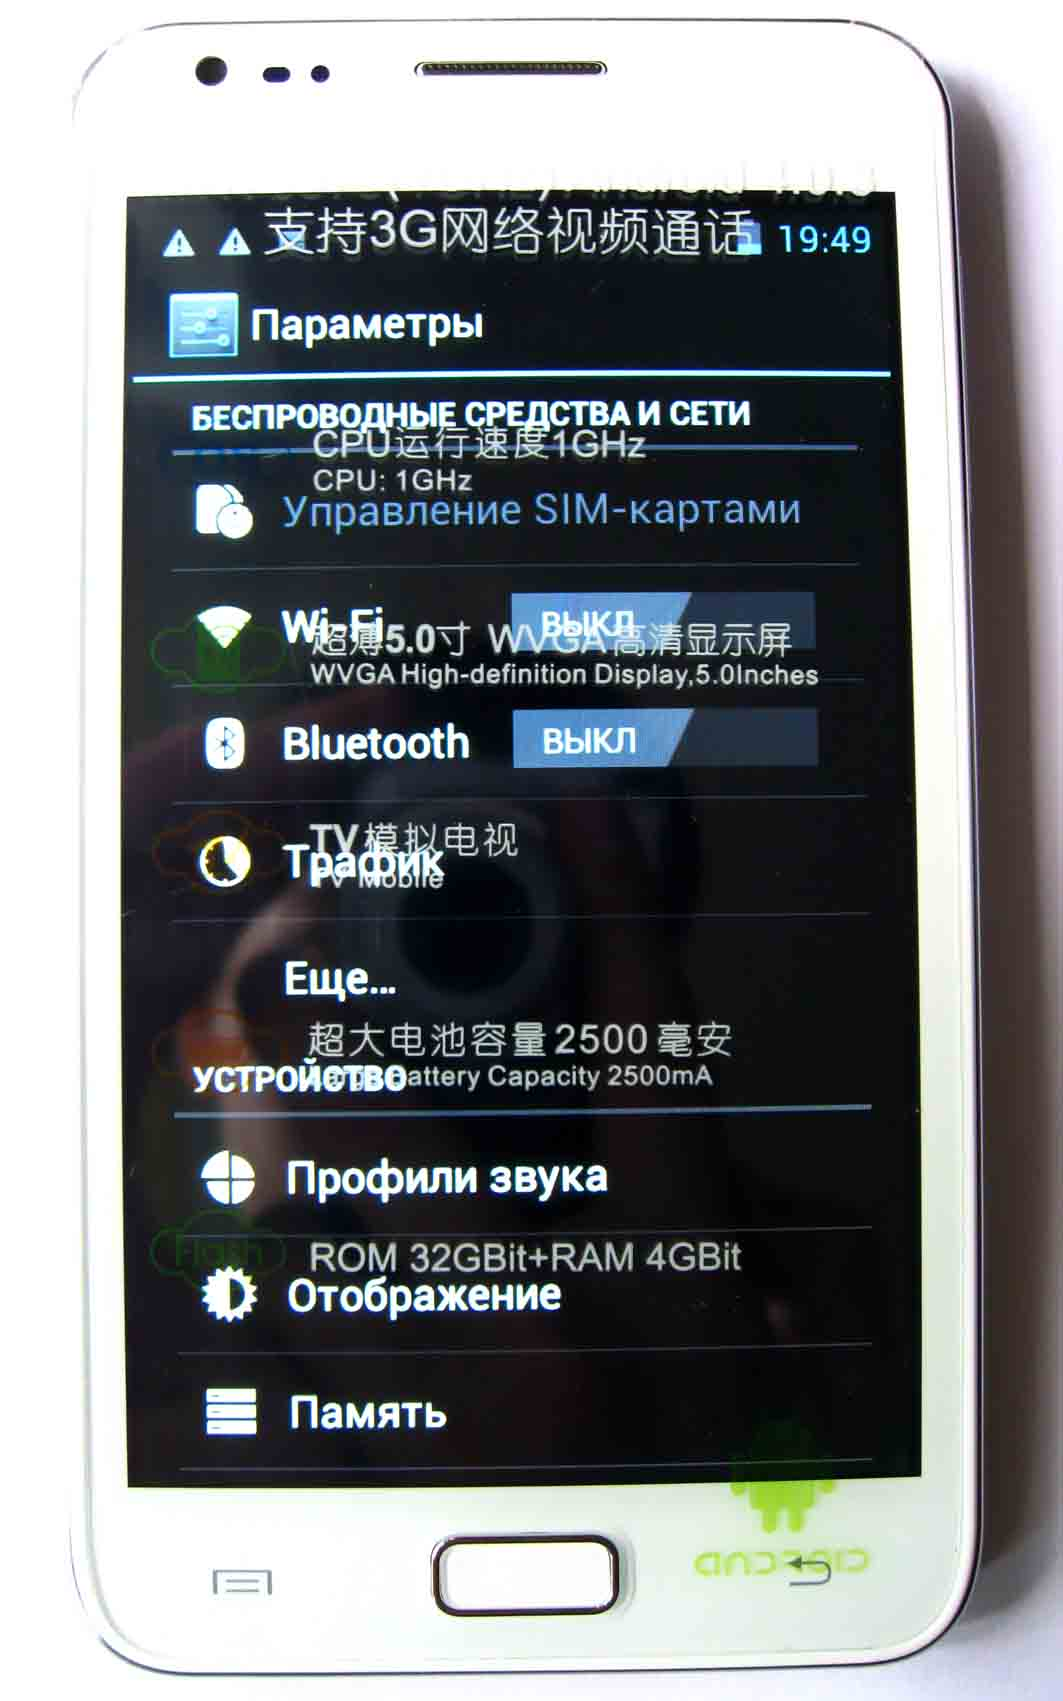 Samsung Galaxy Note i9220 - Wi-Fi, доступные сети